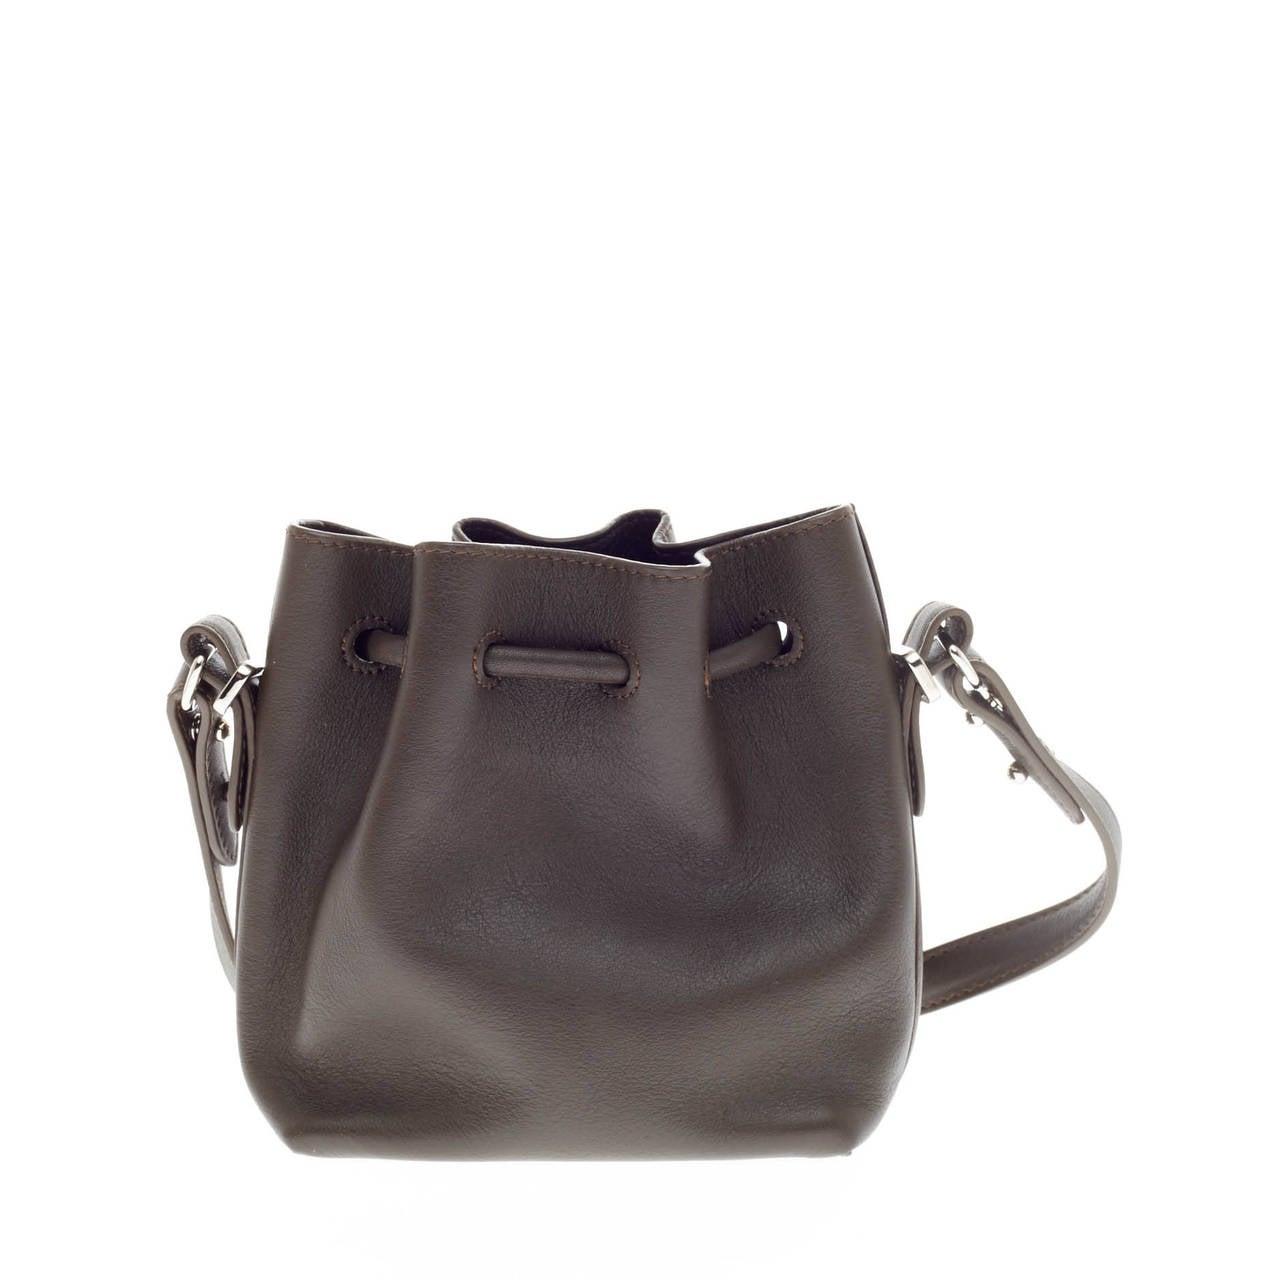 Women's Proenza Schouler Bucket Bag Leather Tiny For Sale